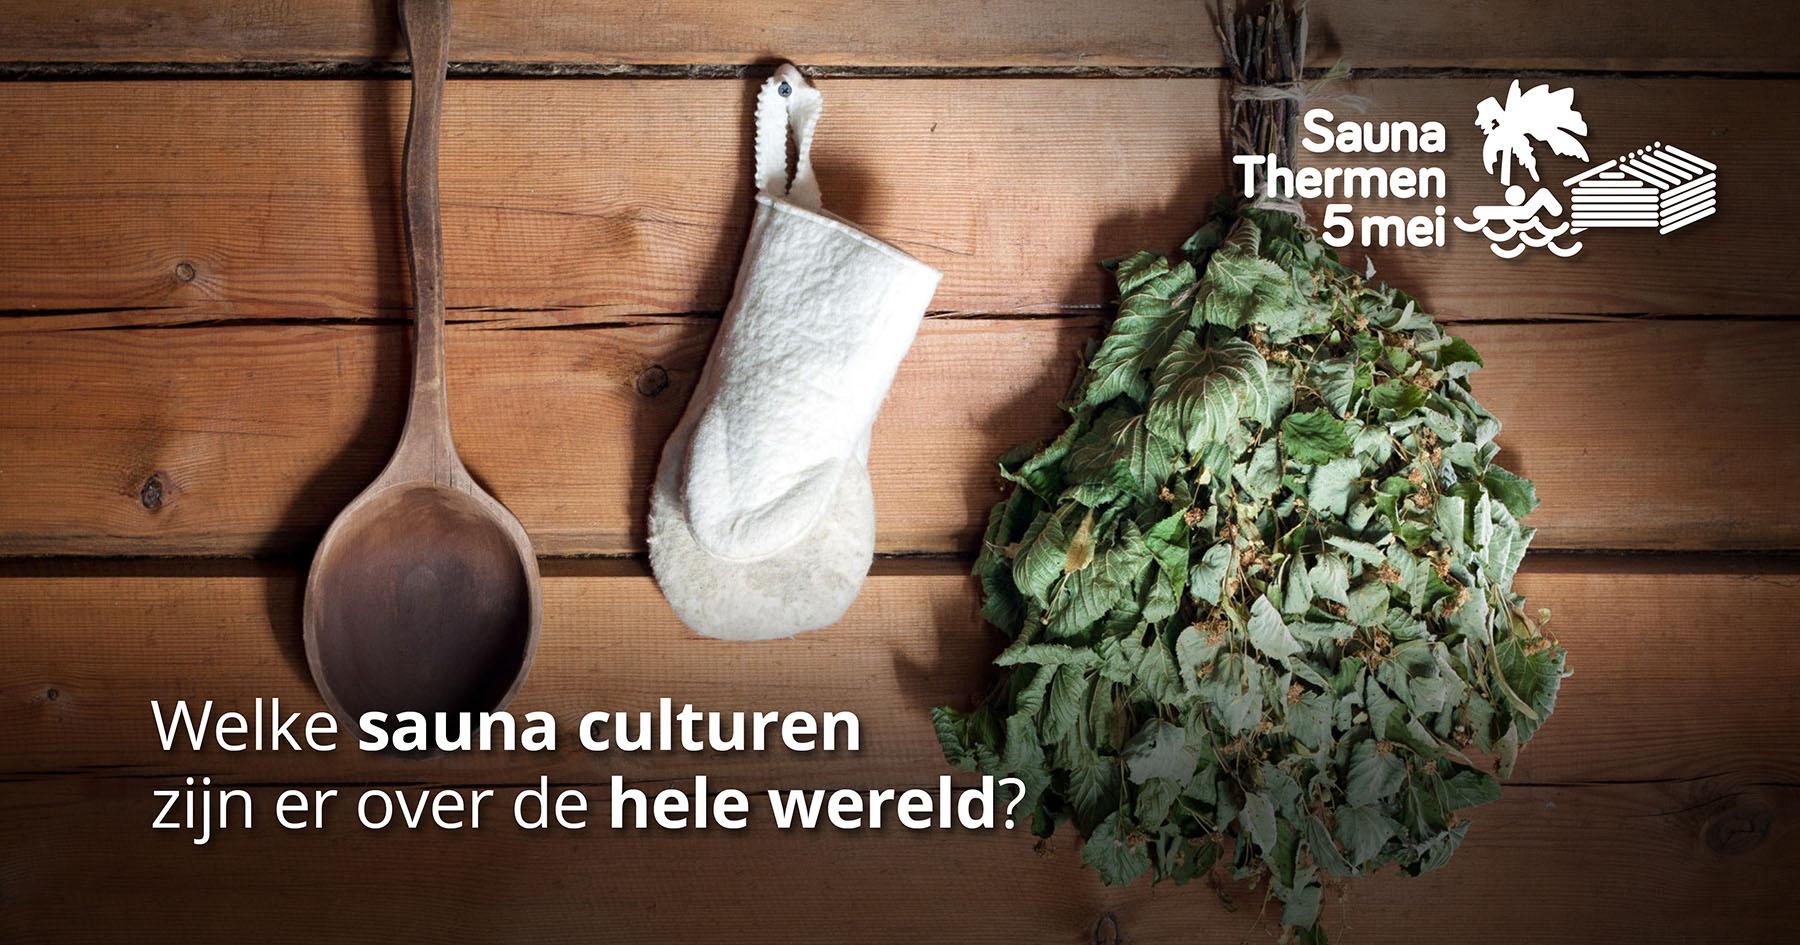 sauna rituelen wereldwijd